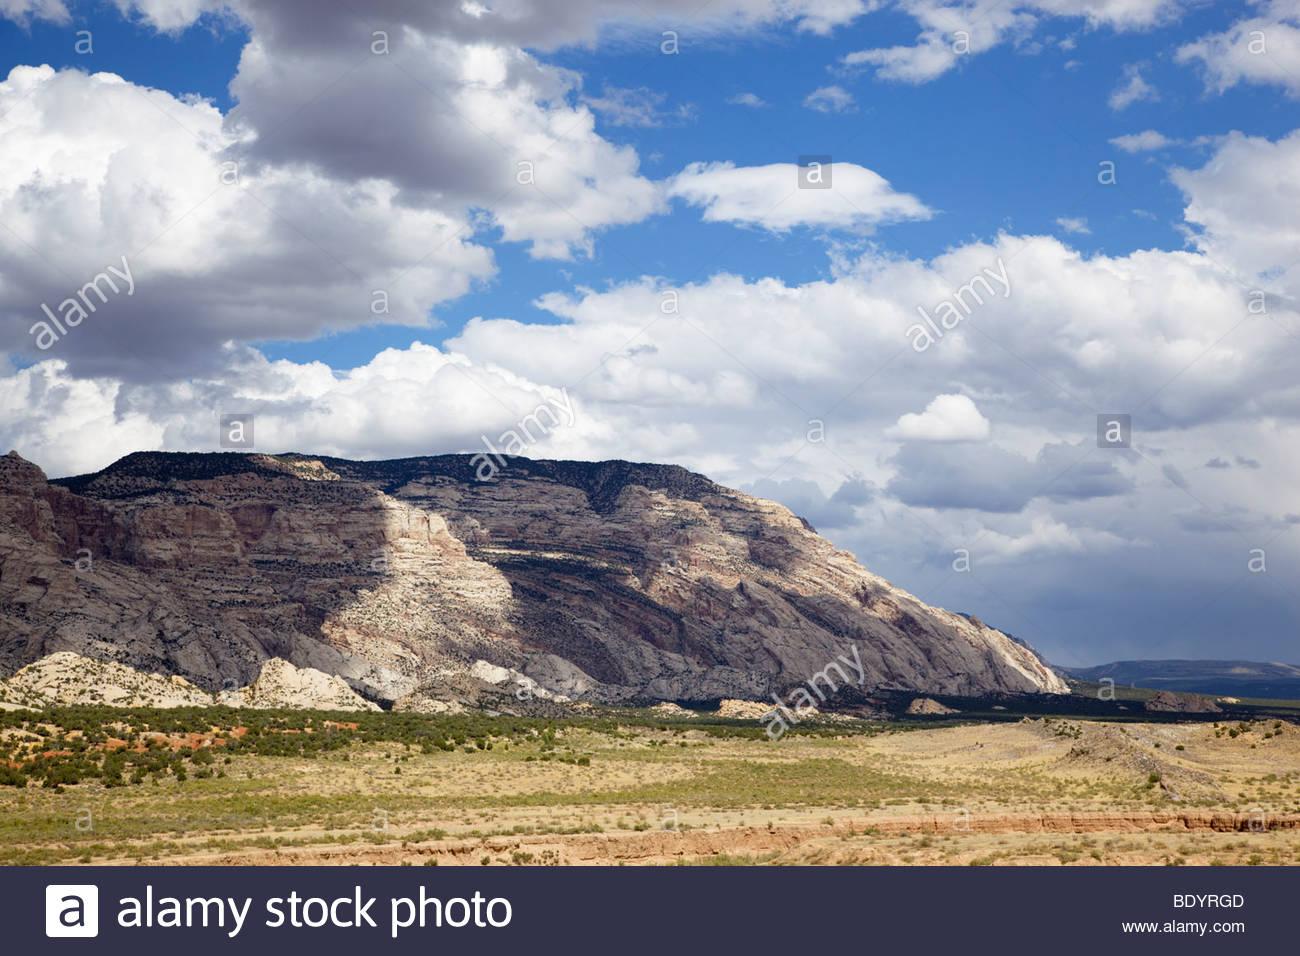 Blue; Mountain; Anticline; up; thrust; Utah; - Stock Image